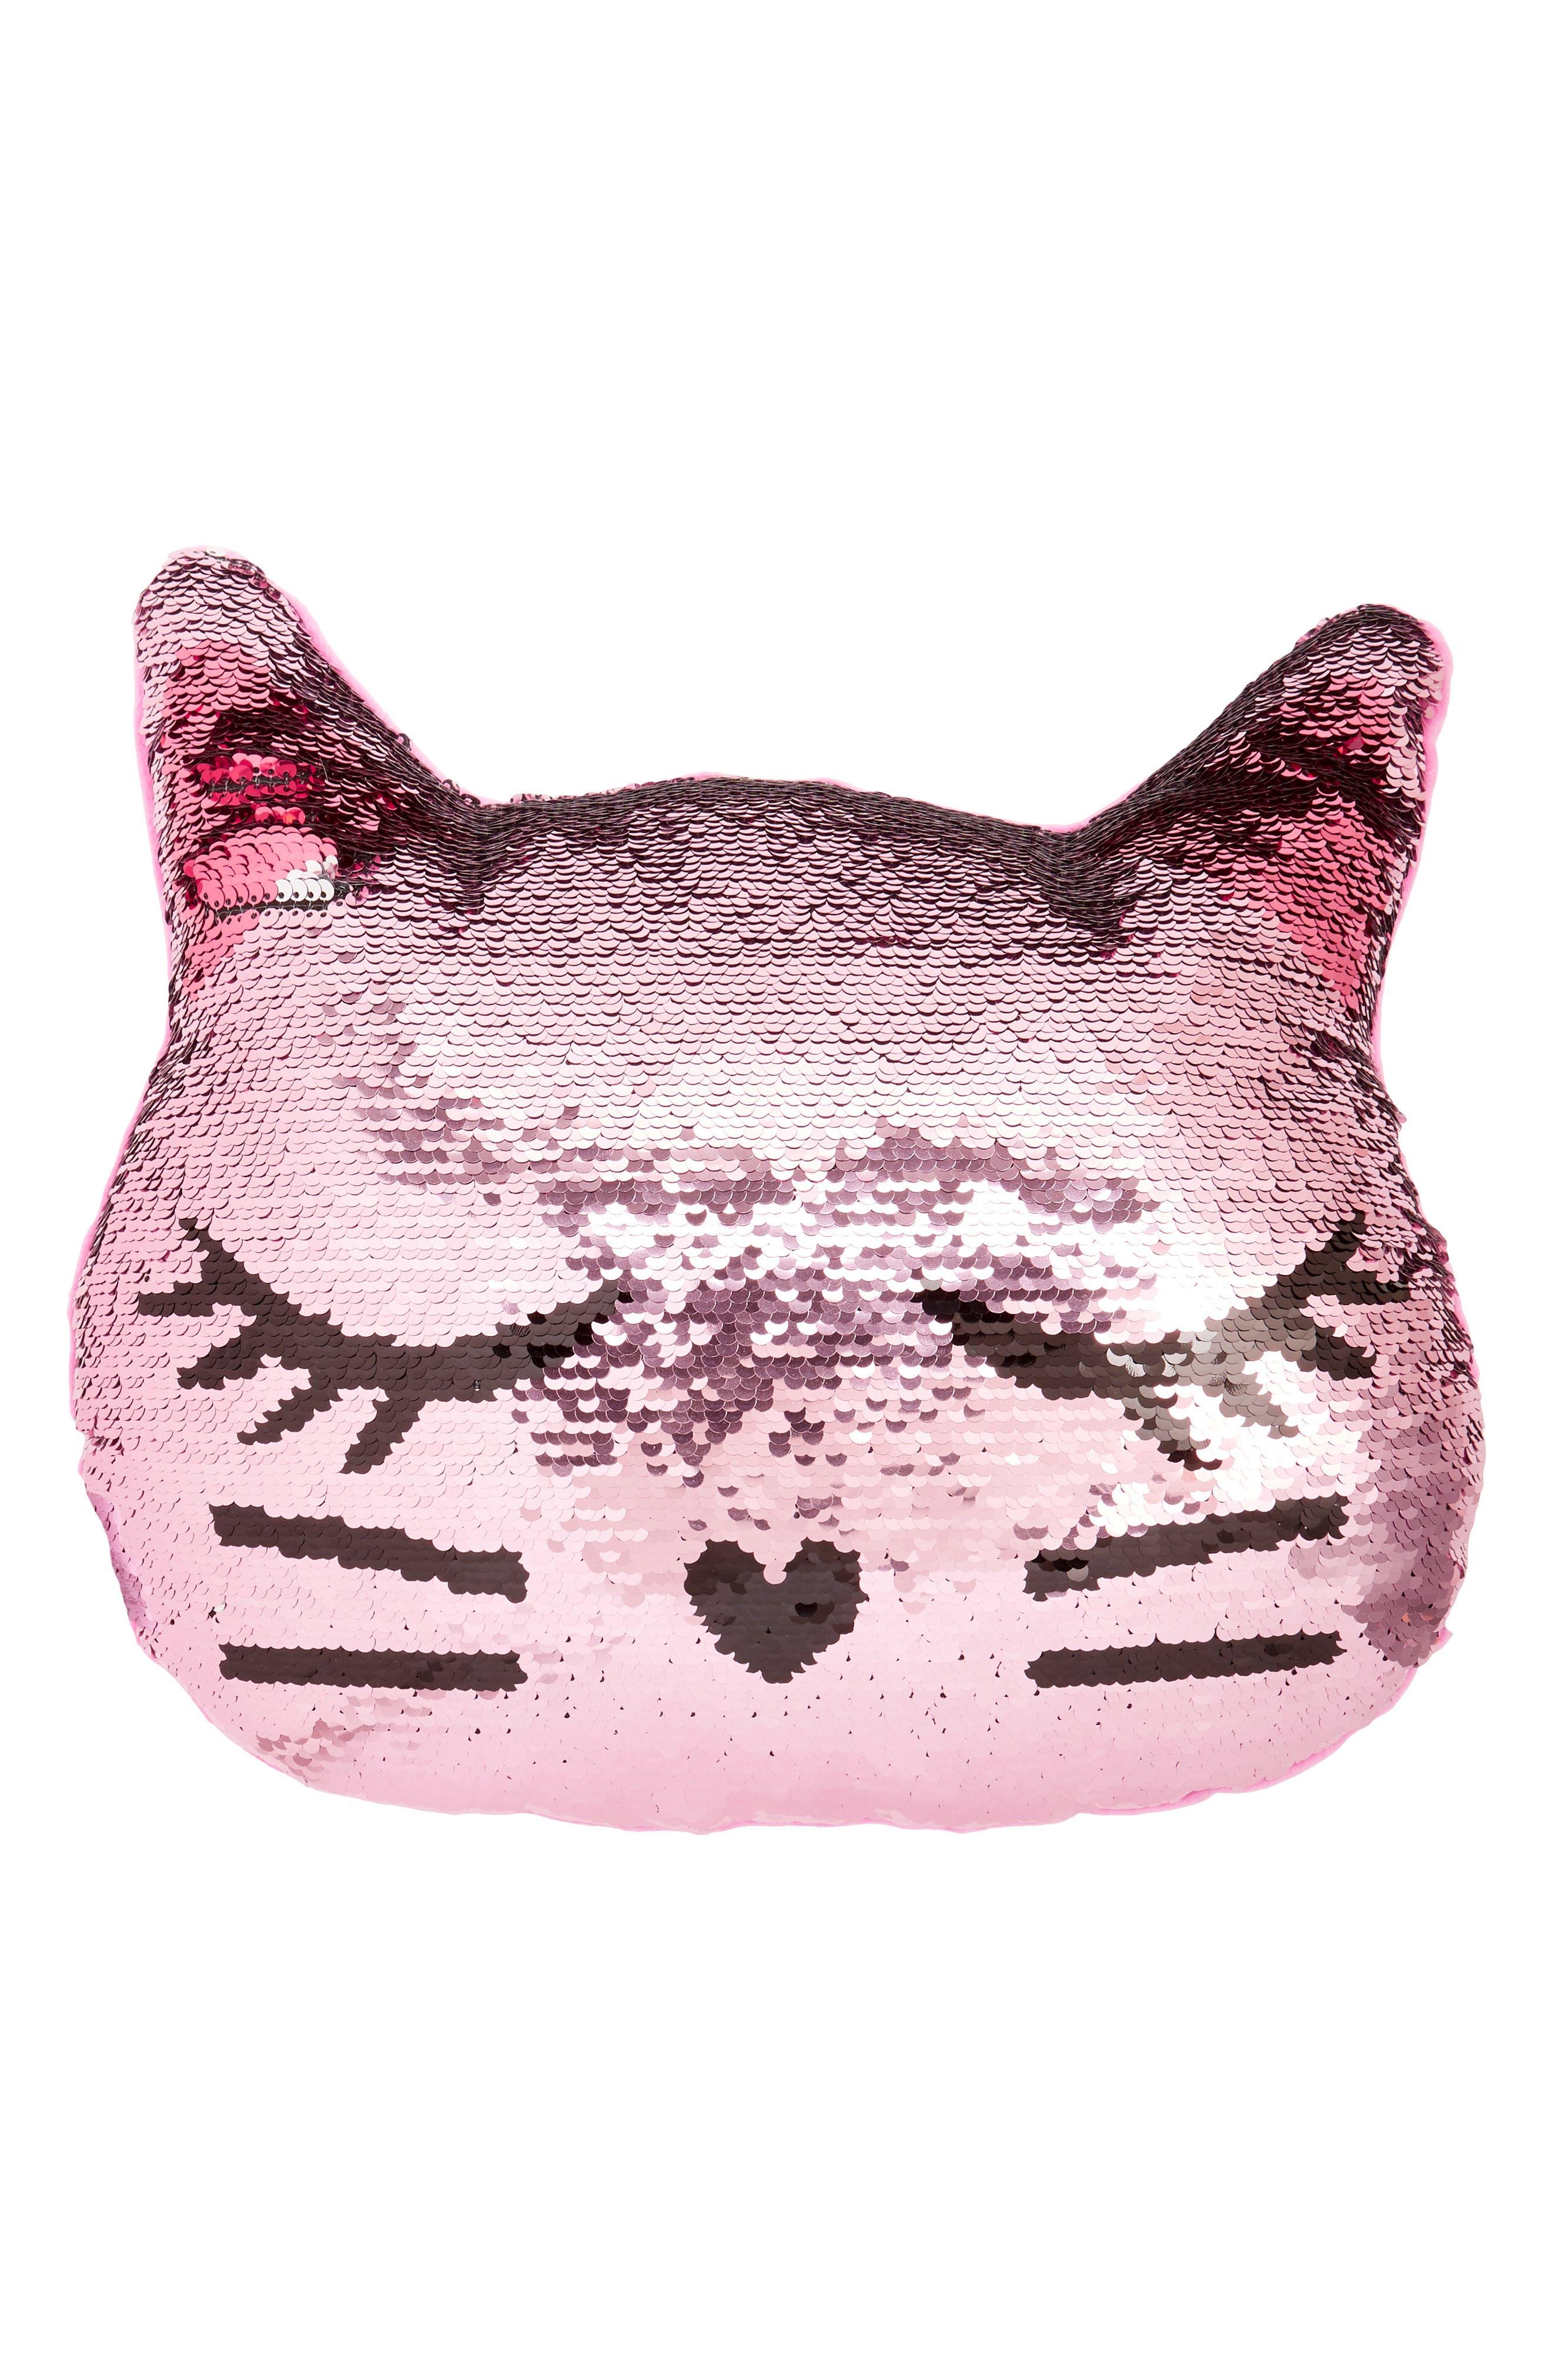 Reversible Sequin Cat Pillow,                             Main thumbnail 1, color,